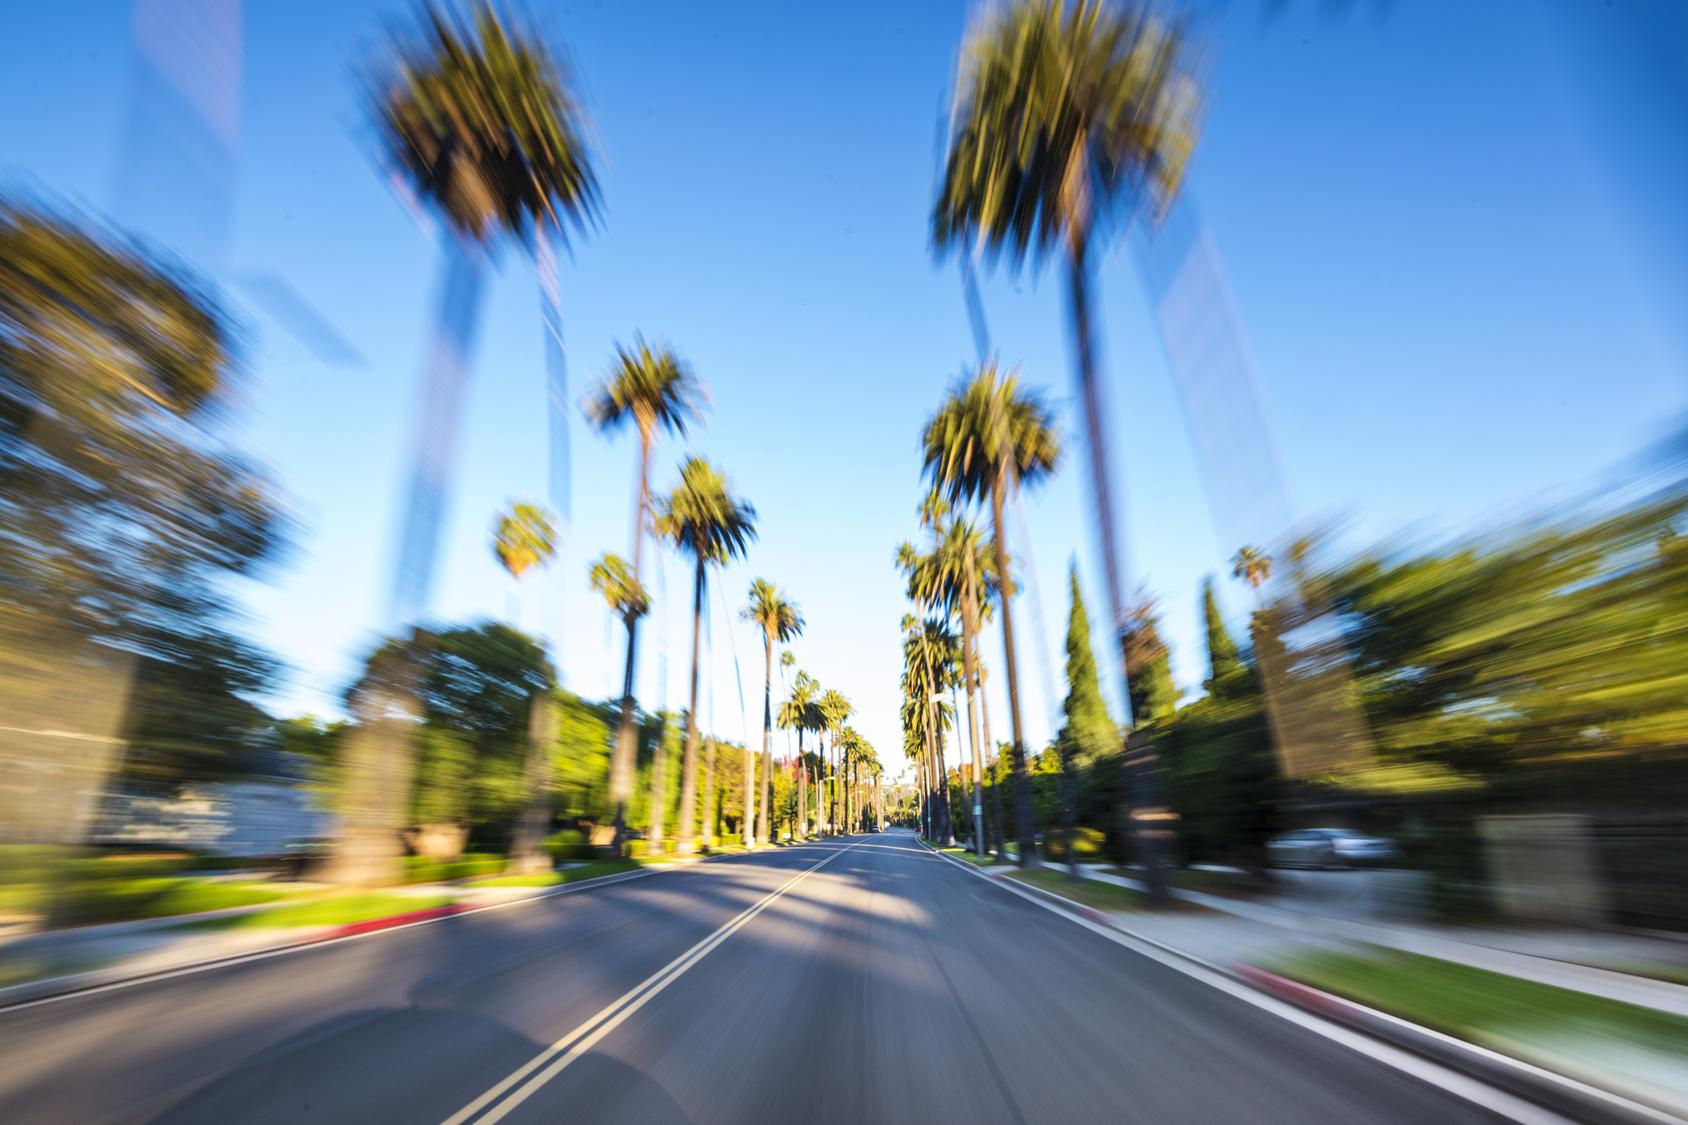 Лос-Анджелес — город американской мечты